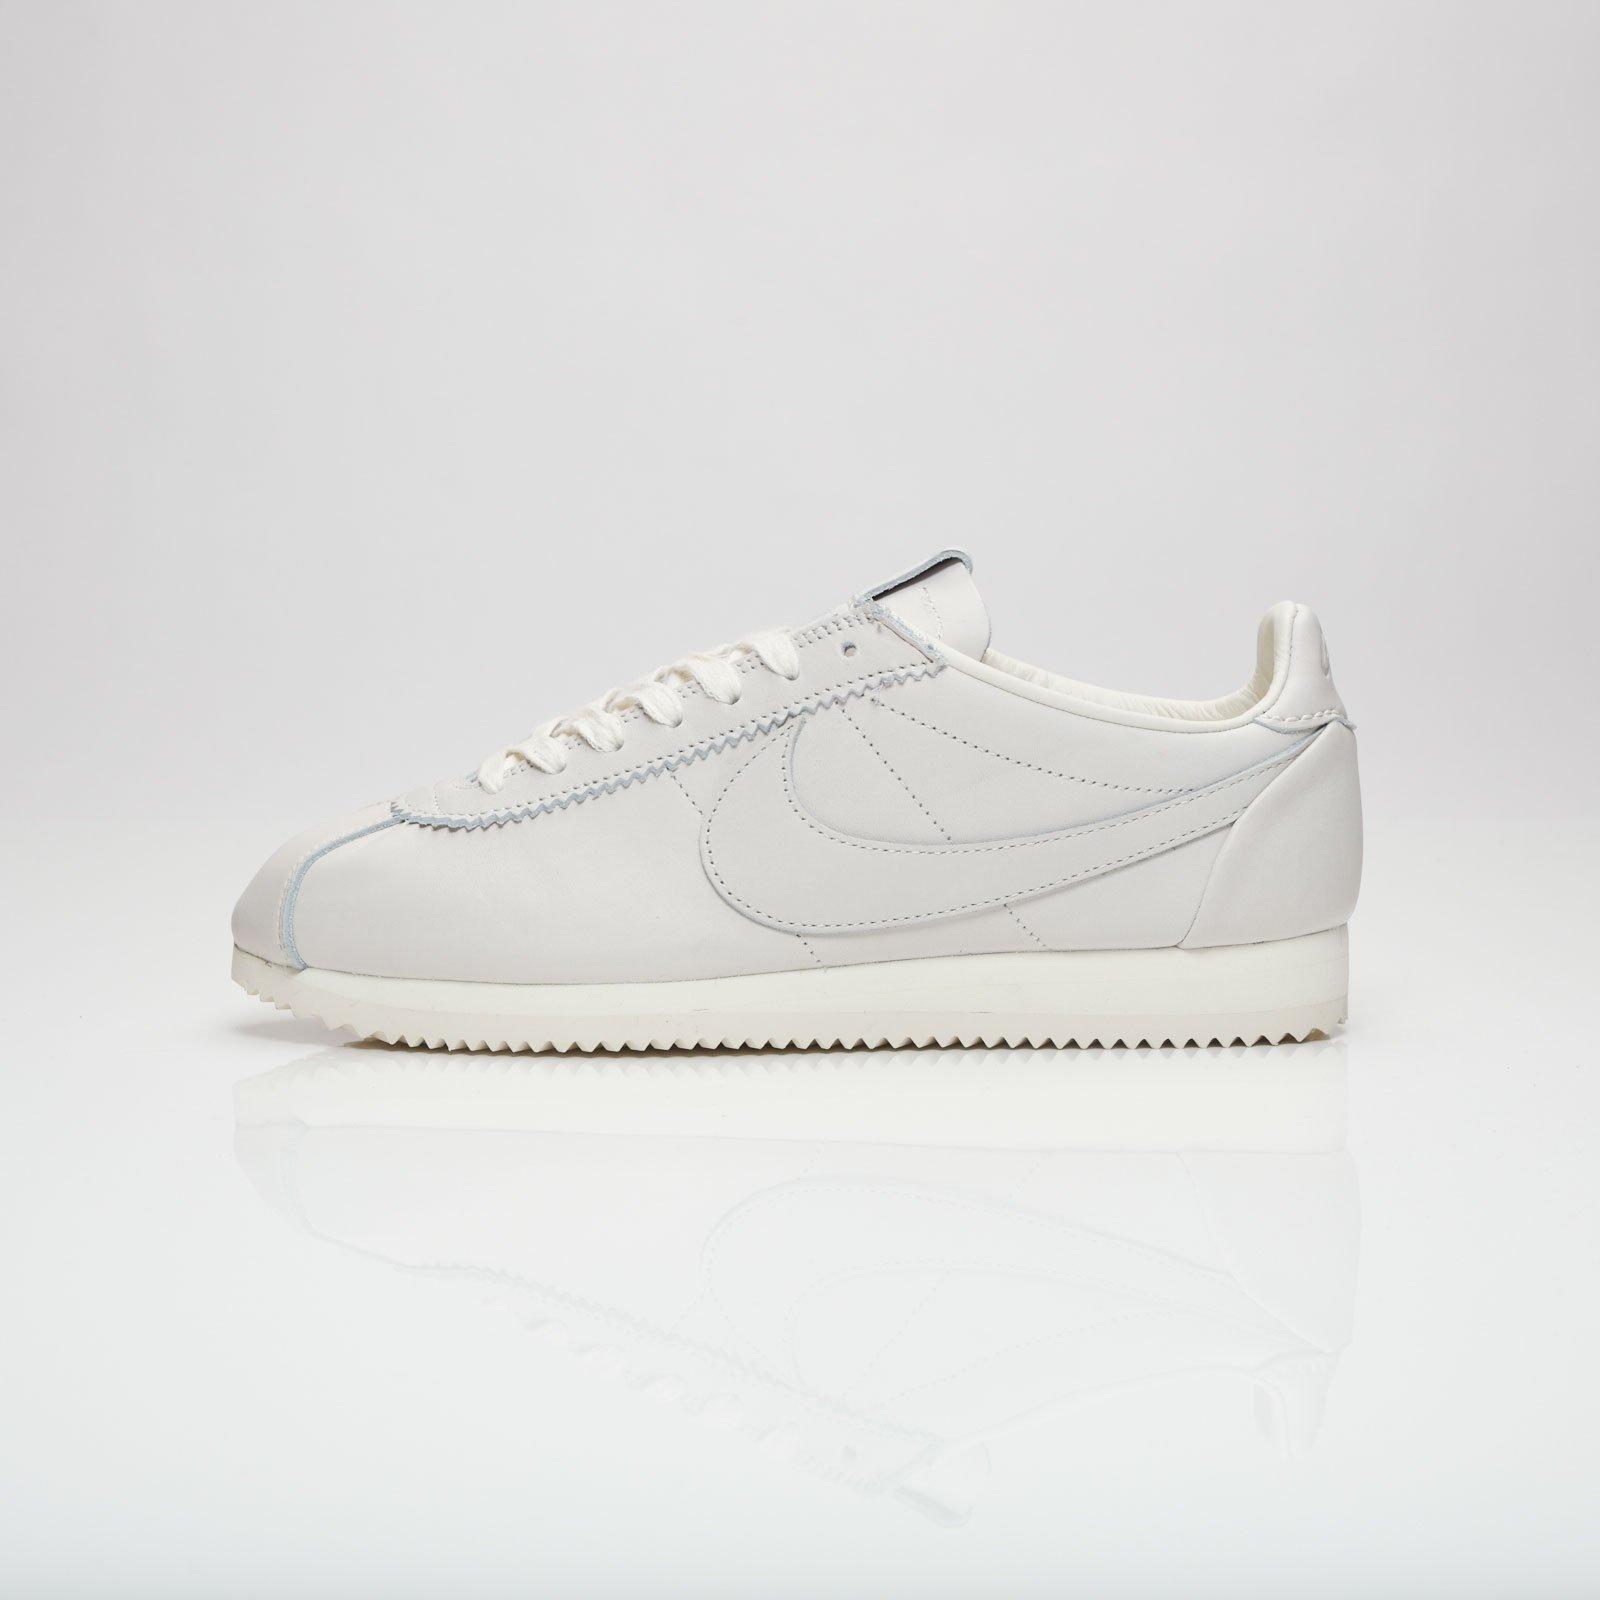 new concept 61f0c d87b0 Nike Classic Cortez Premium Qs Tz - 898088-100 - Sneakersnstuff   sneakers    streetwear online since 1999